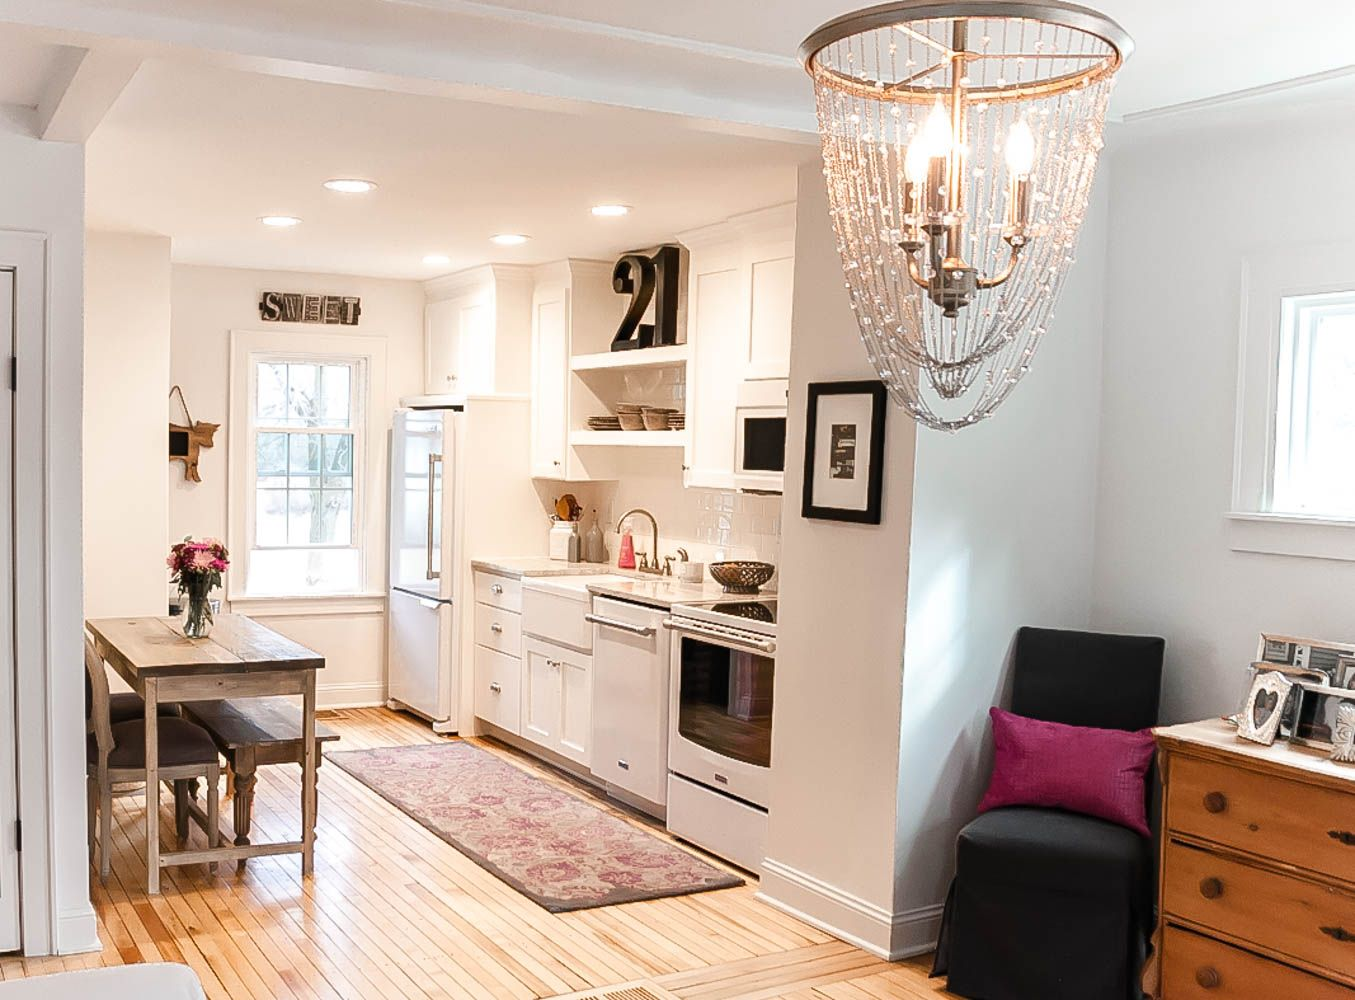 white kitchen remodel minneapolis minnesota custom cabinetry subway